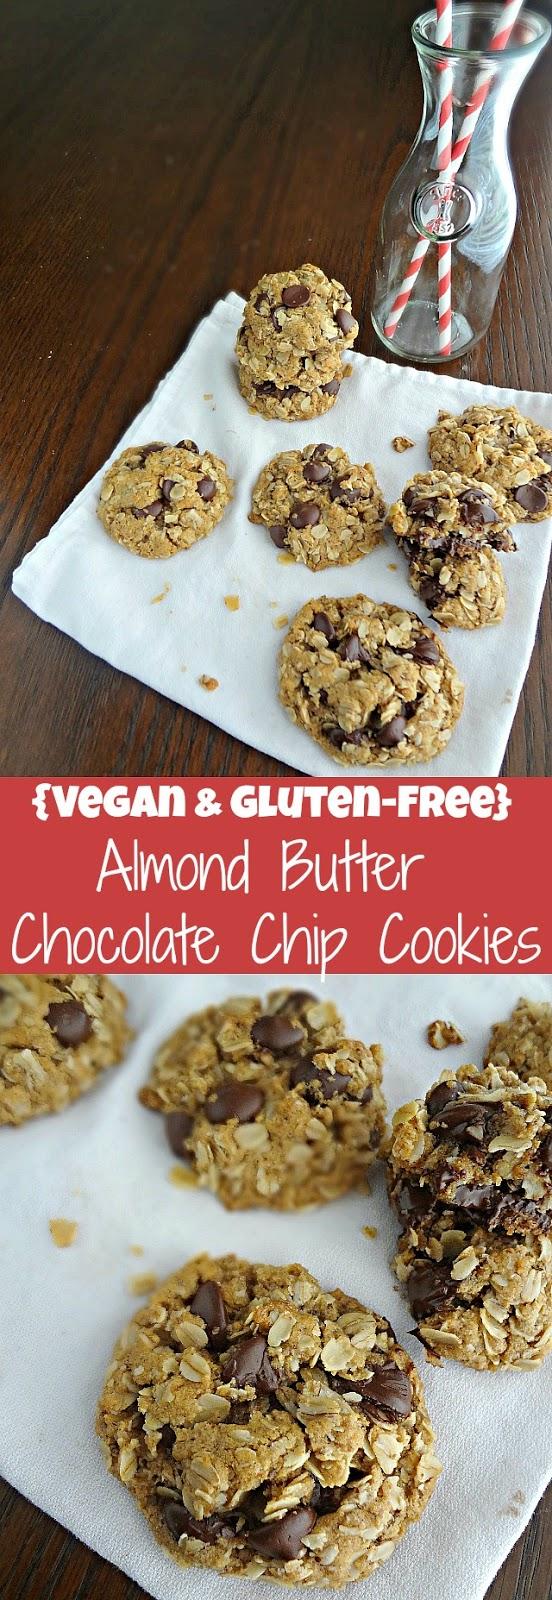 {Vegan & Gluten-free} Almond Butter Chocolate Chip Cookies